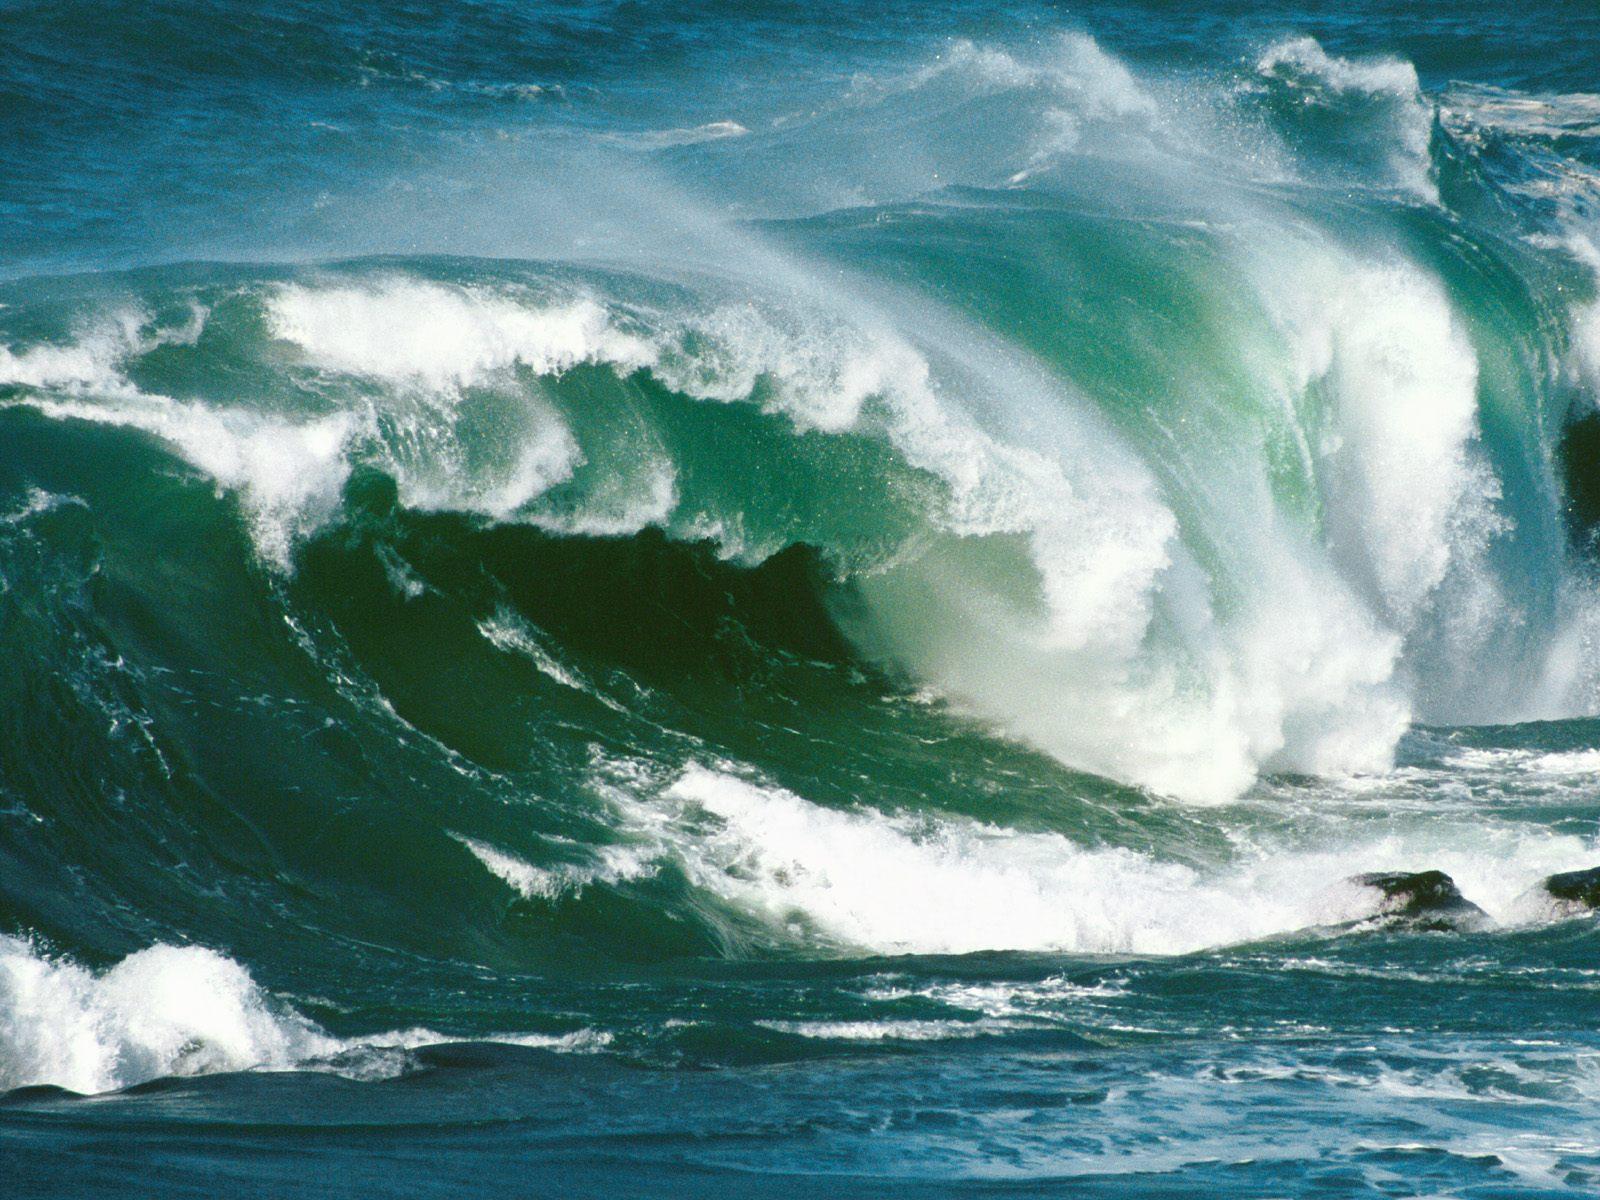 bulkupload_Ocean-Wallpaper_North-Island-Waves-New-Zealand